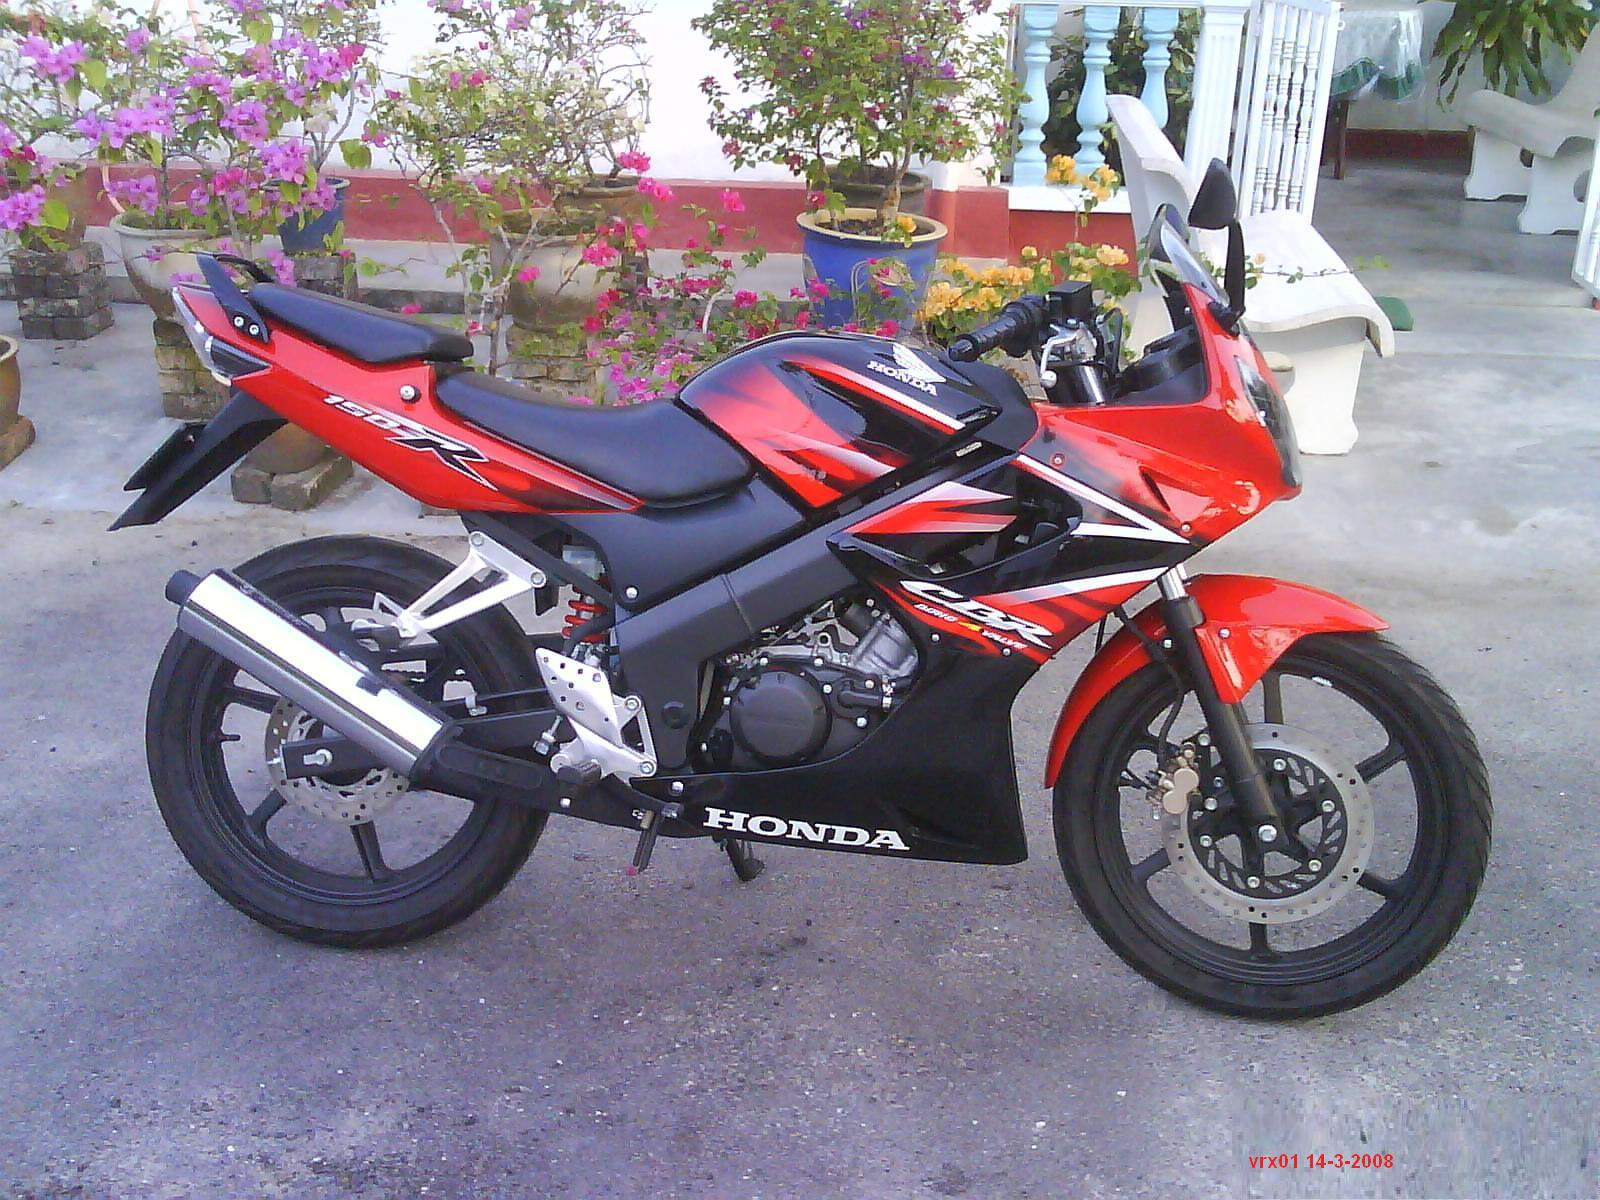 Harga Jual Honda Cbr 150 Lama Verza Pakai Full Fairing All New 150r Slick Black White Jakarta Tuan Otomotif Hadirnya Cb Baru